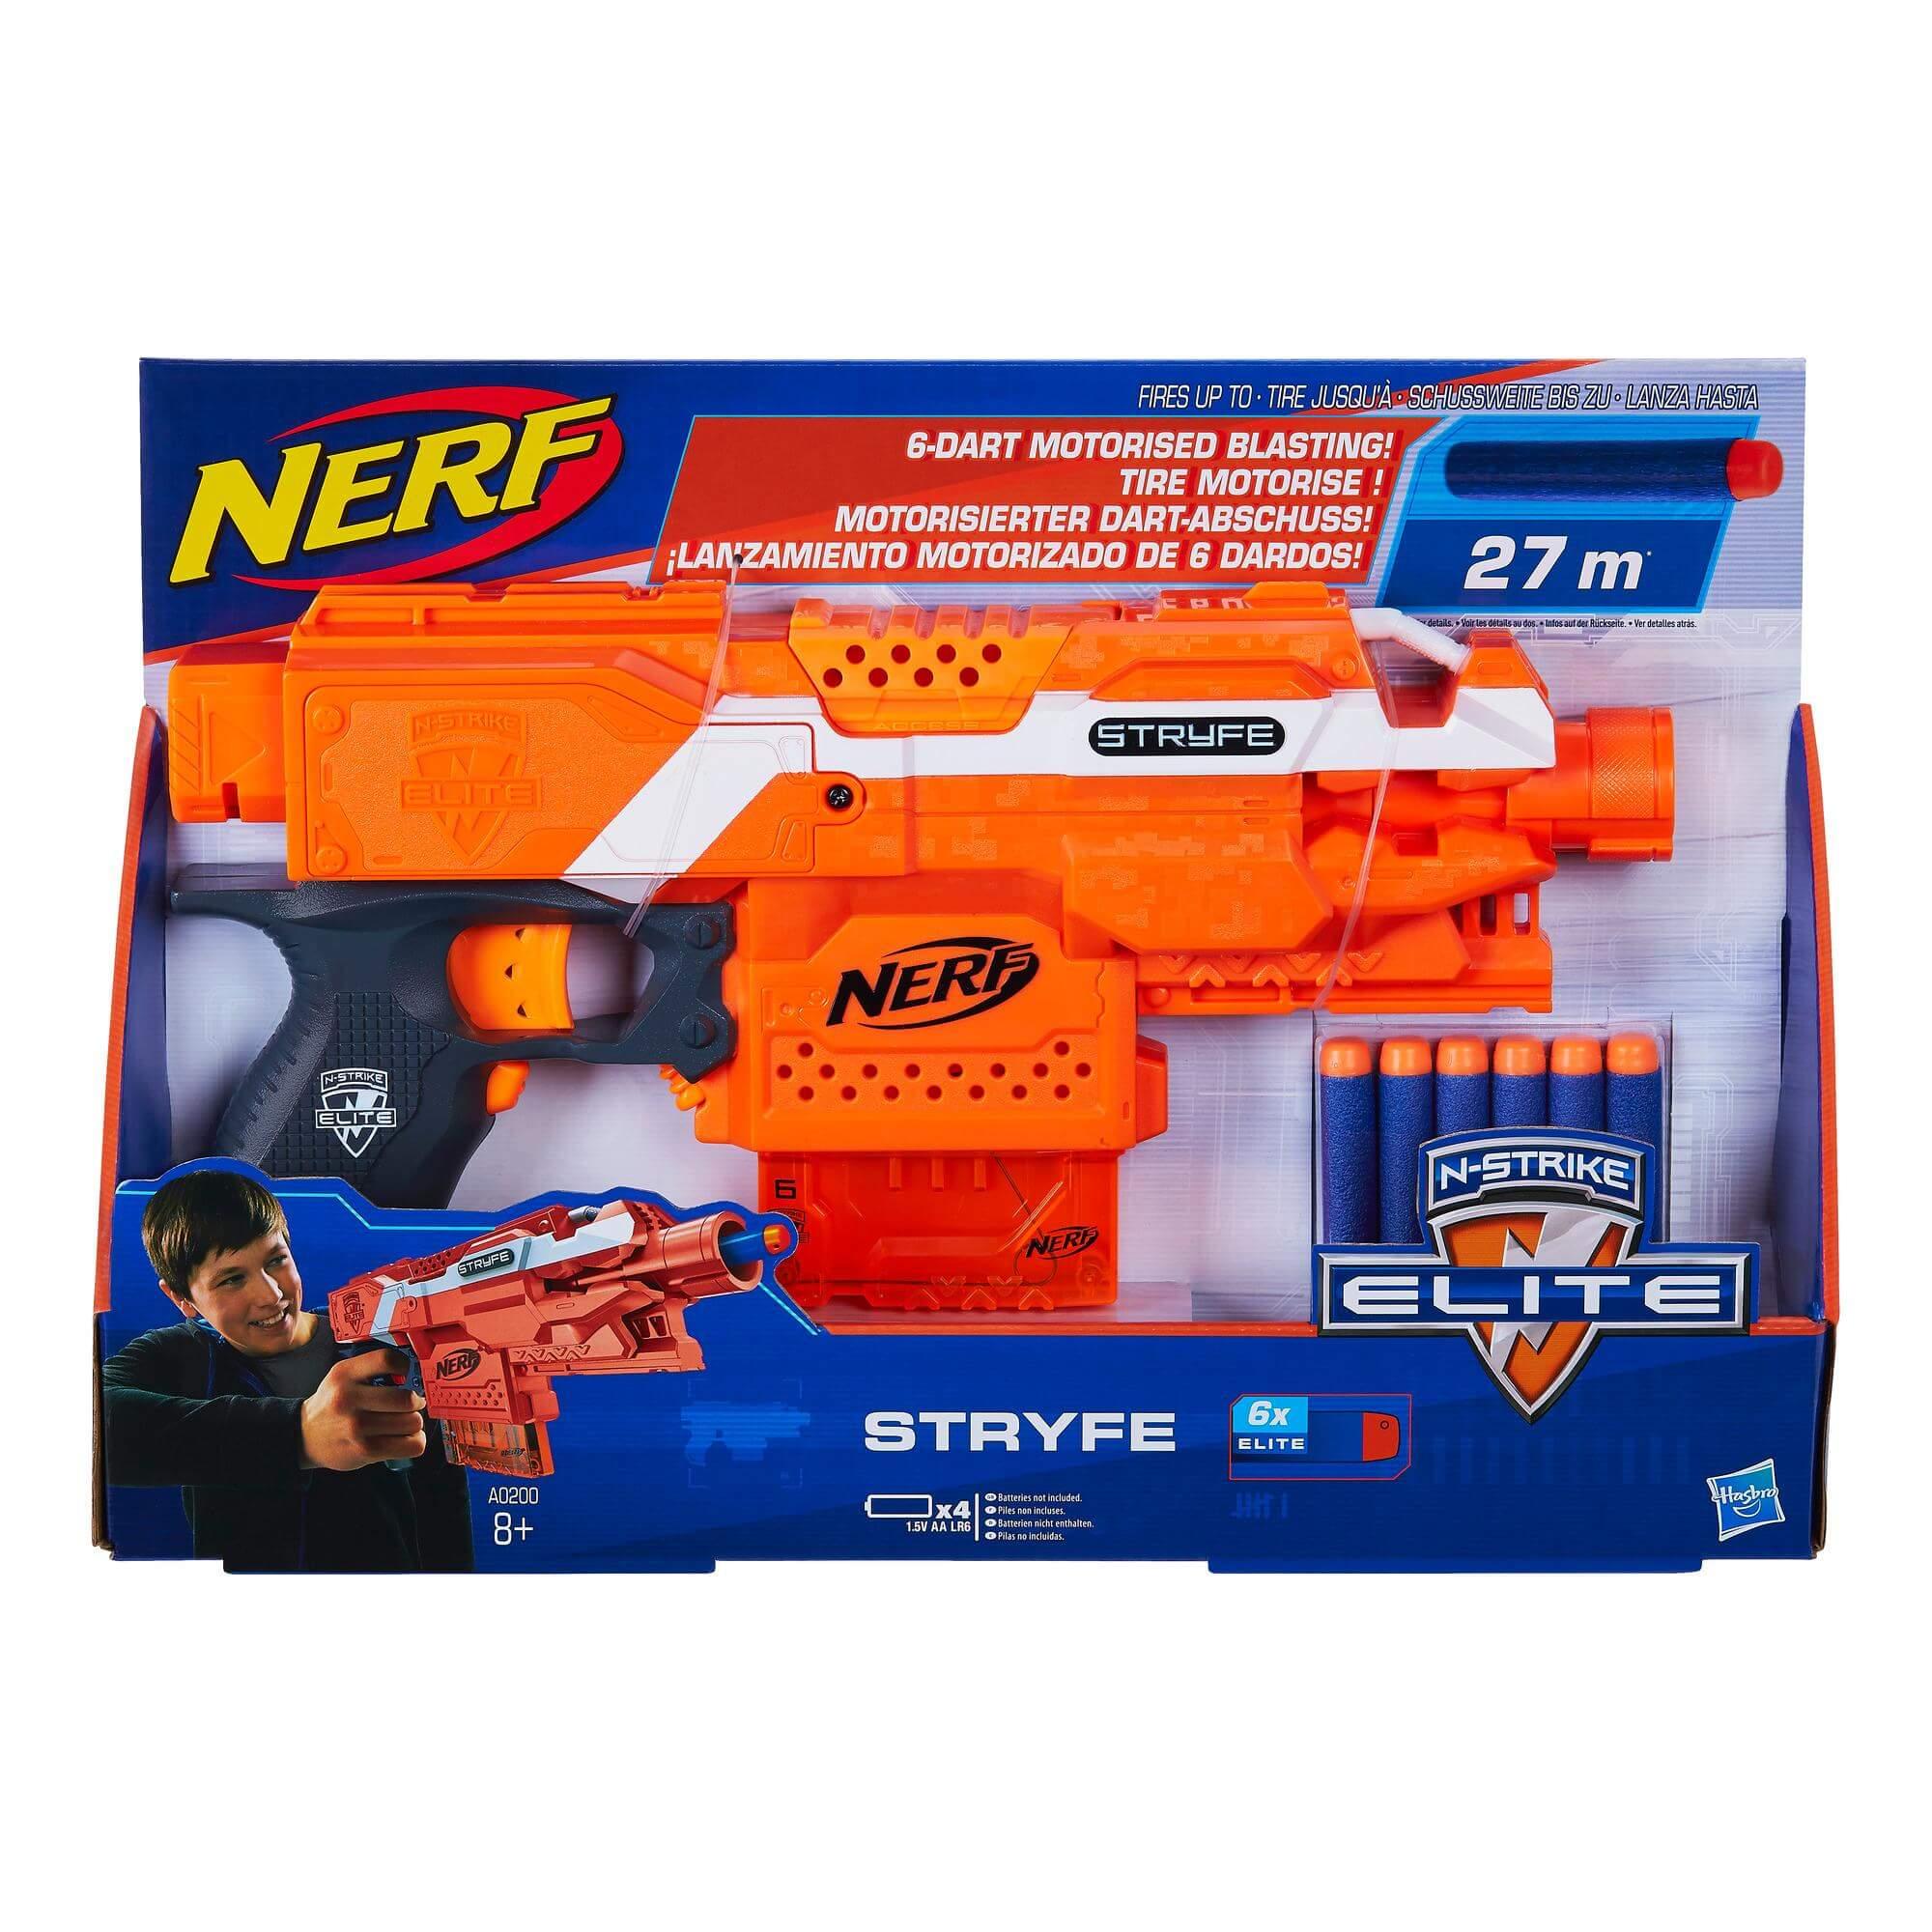 NERF N-Strike Stryfe